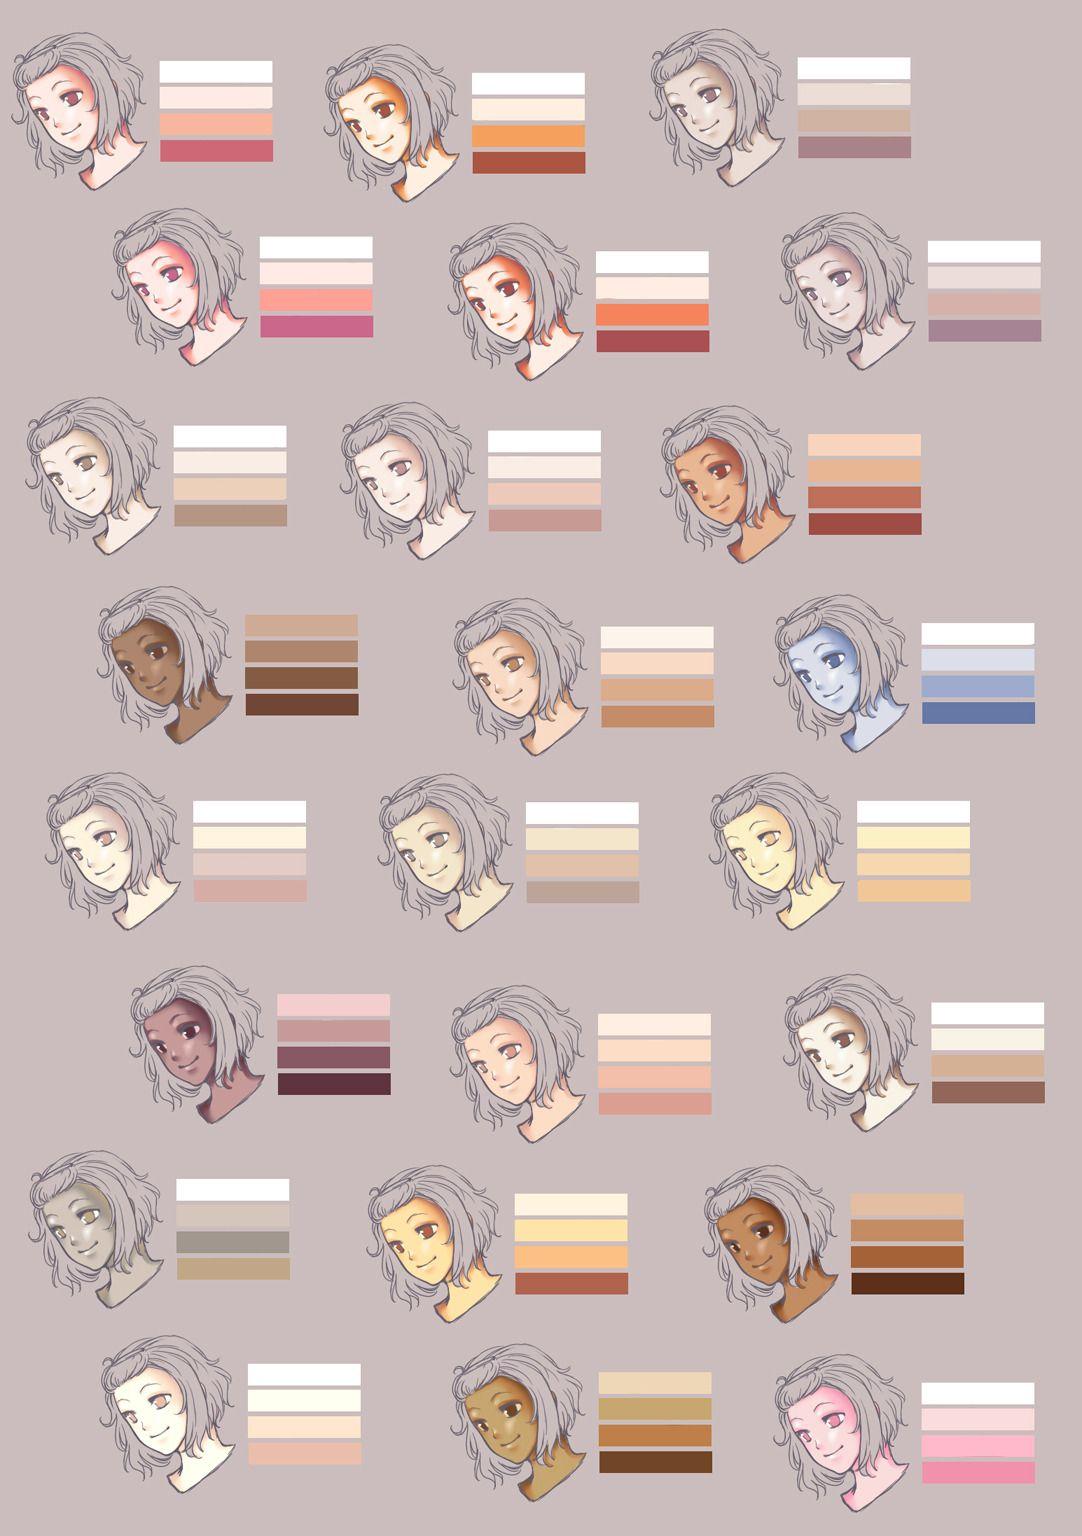 Drawing Deposit Of Yamneko Skin Color Palette From Rueme Colorful Drawings Skin Color Palette Skin Drawing